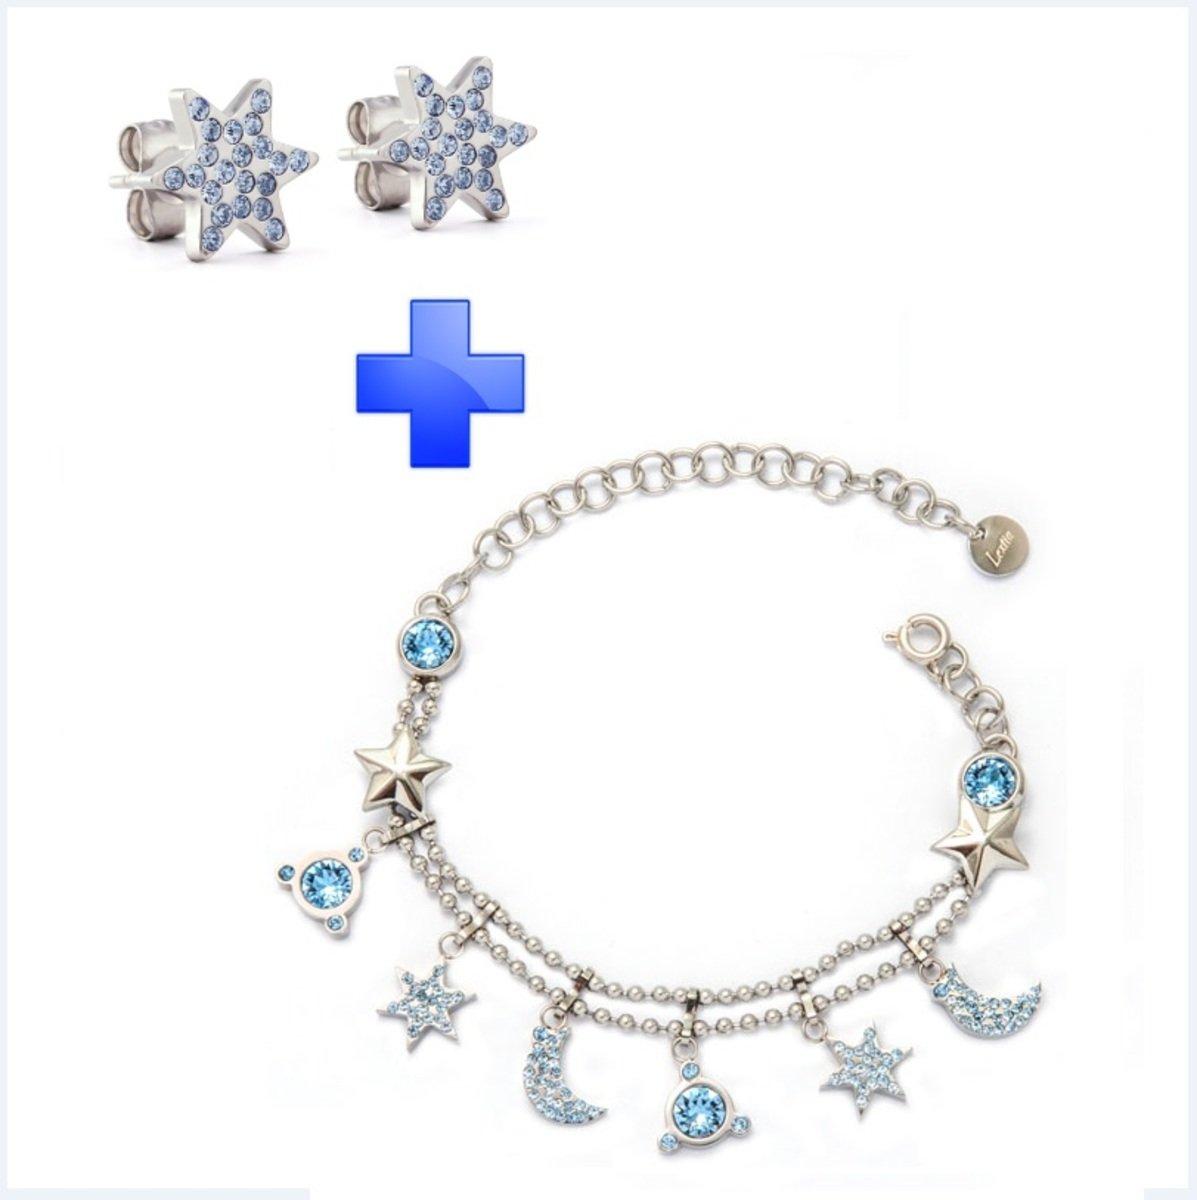 Xmas Gift Set – Galaxia 精鋼 手鏈 耳環